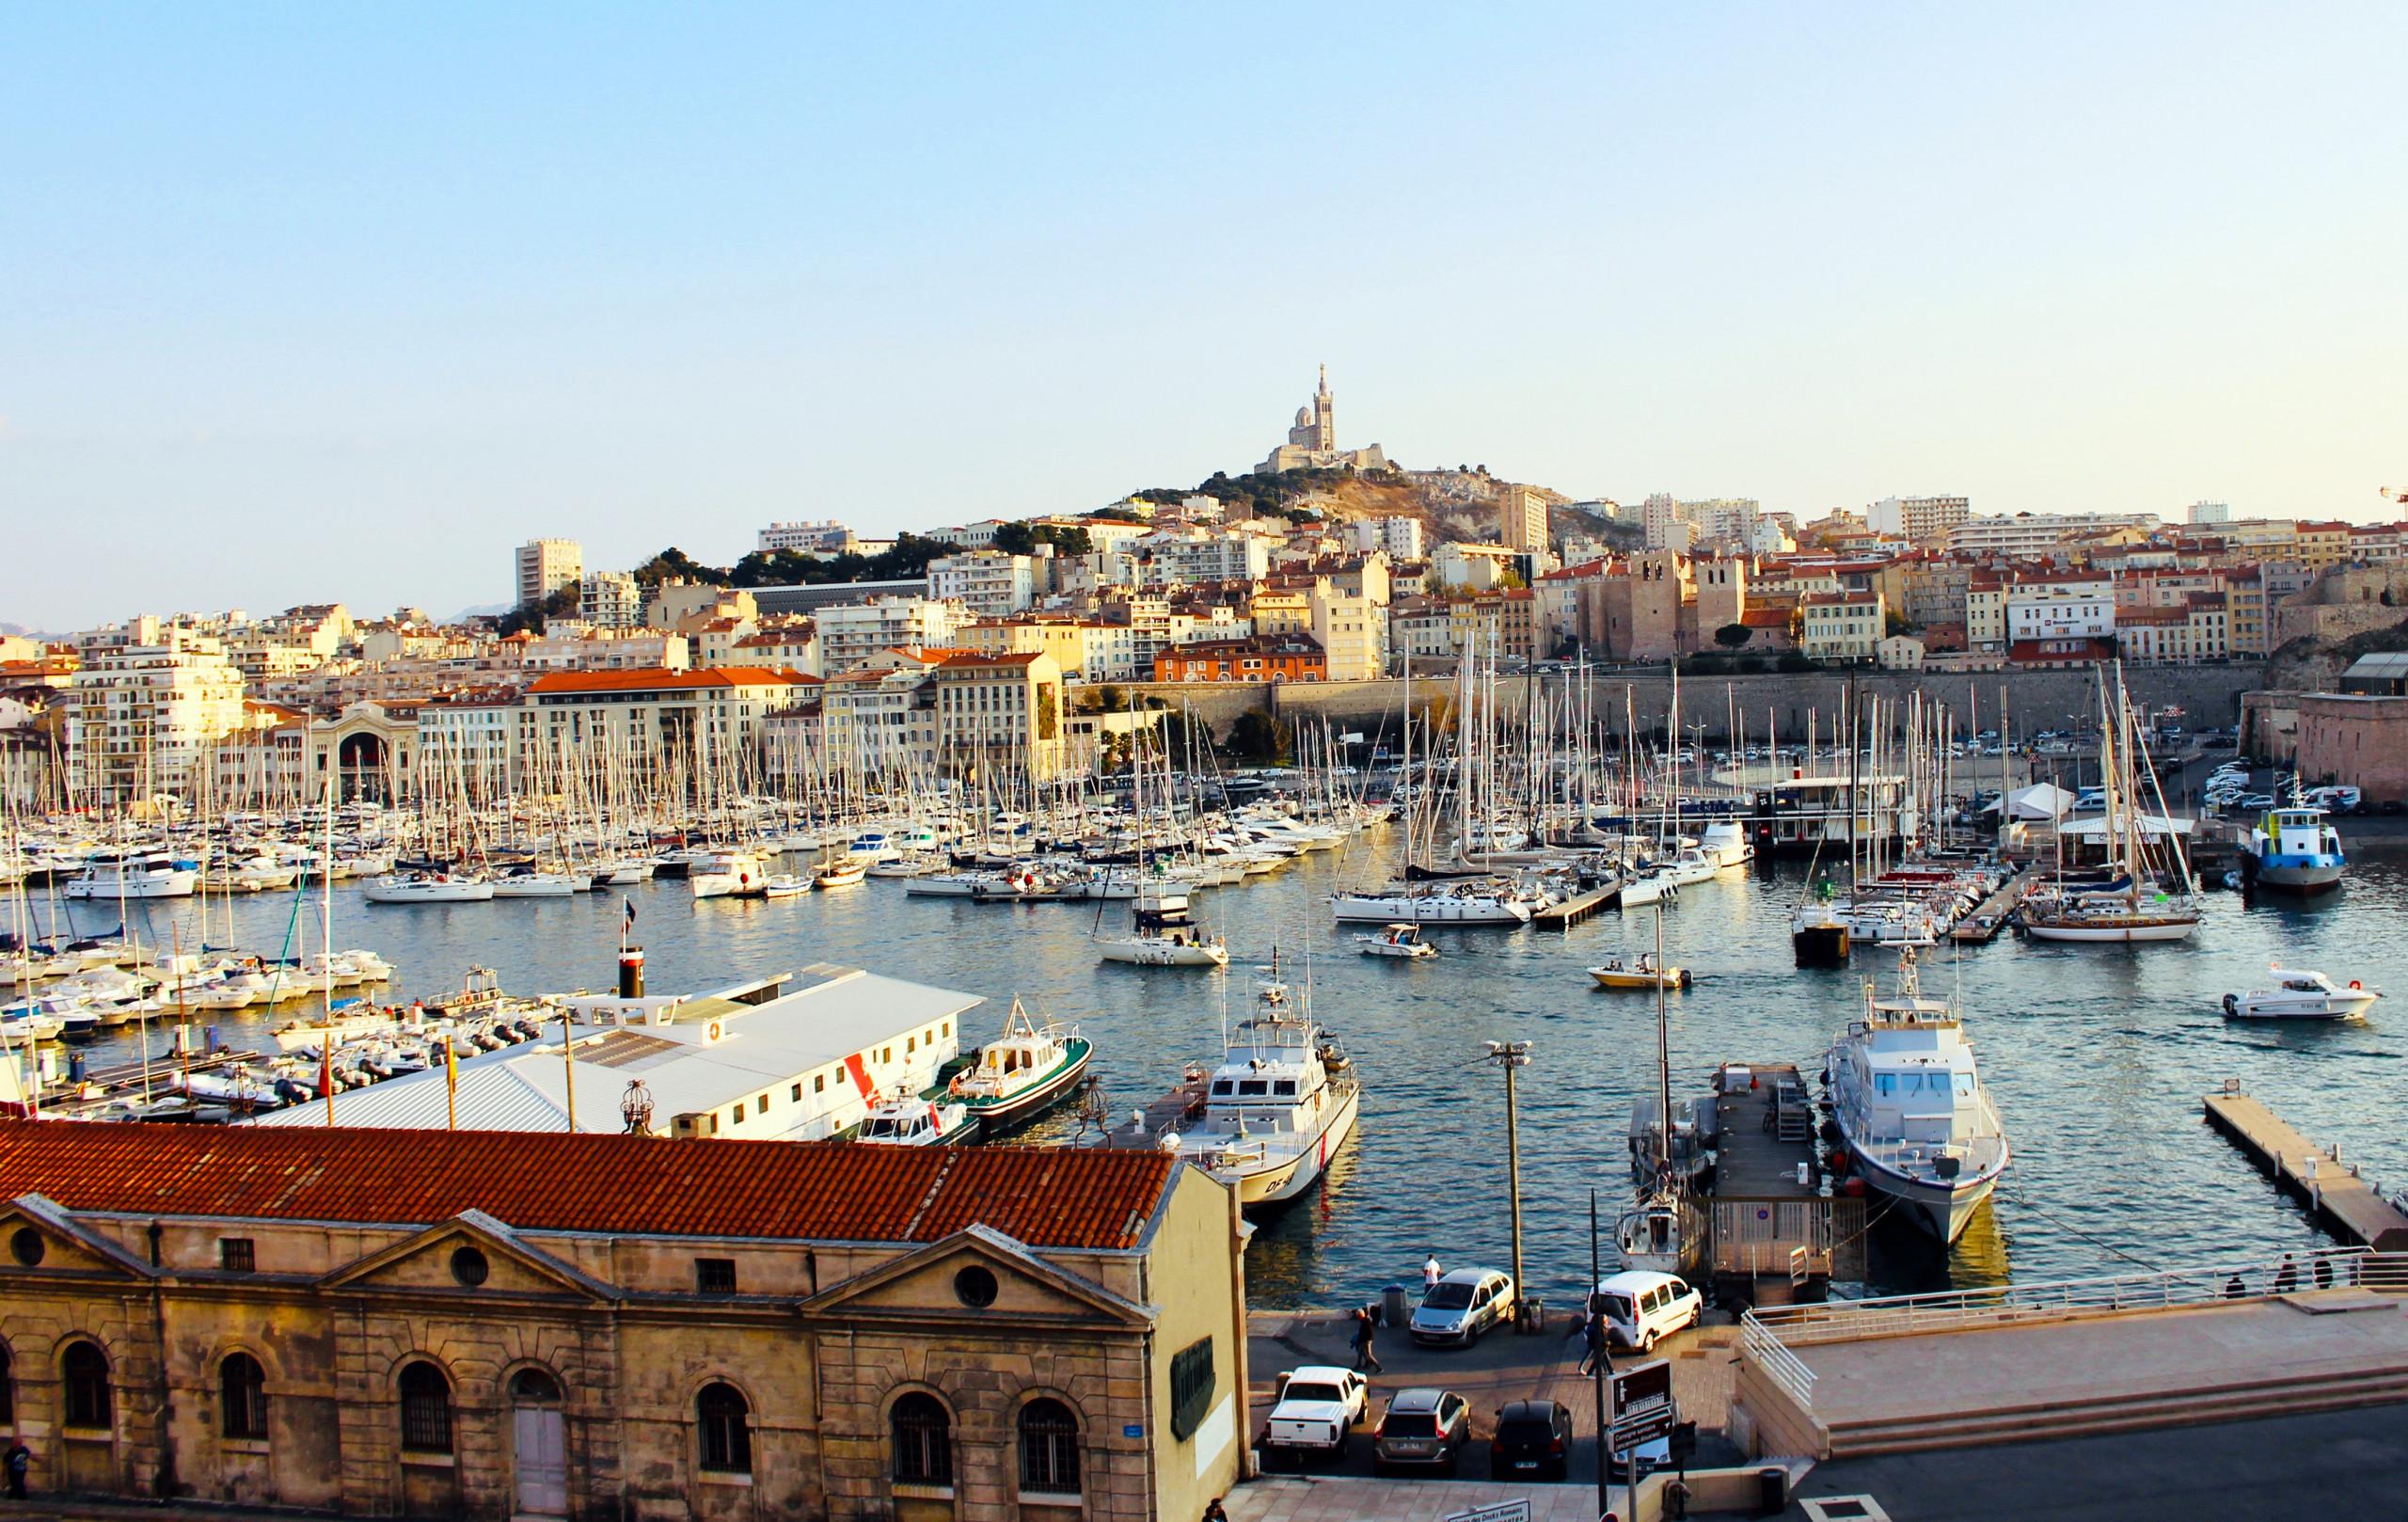 image of Vieux Port